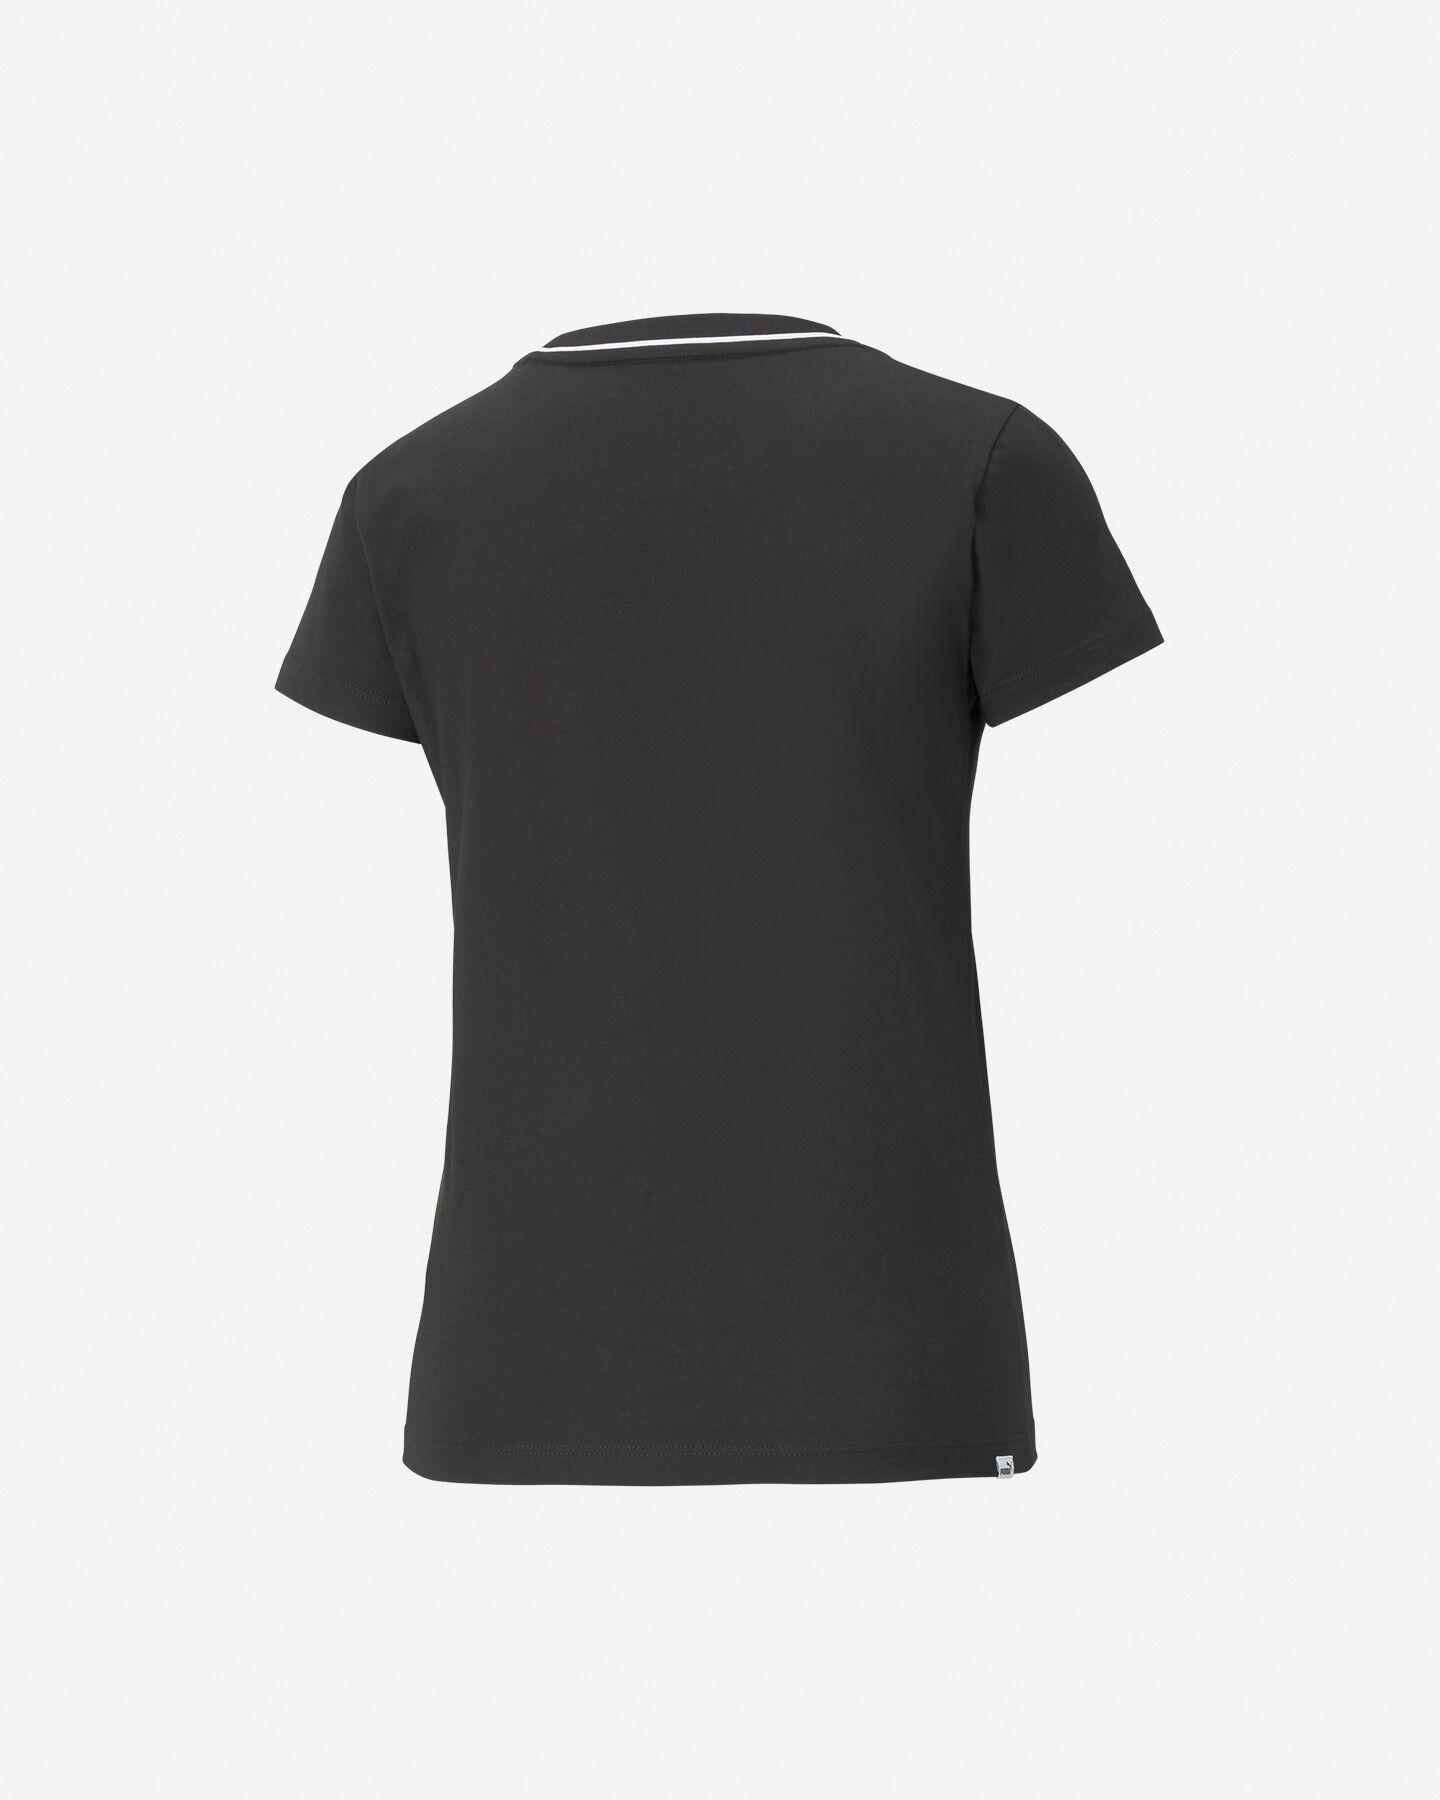 T-Shirt PUMA NEW LOGO W S5253684 scatto 1